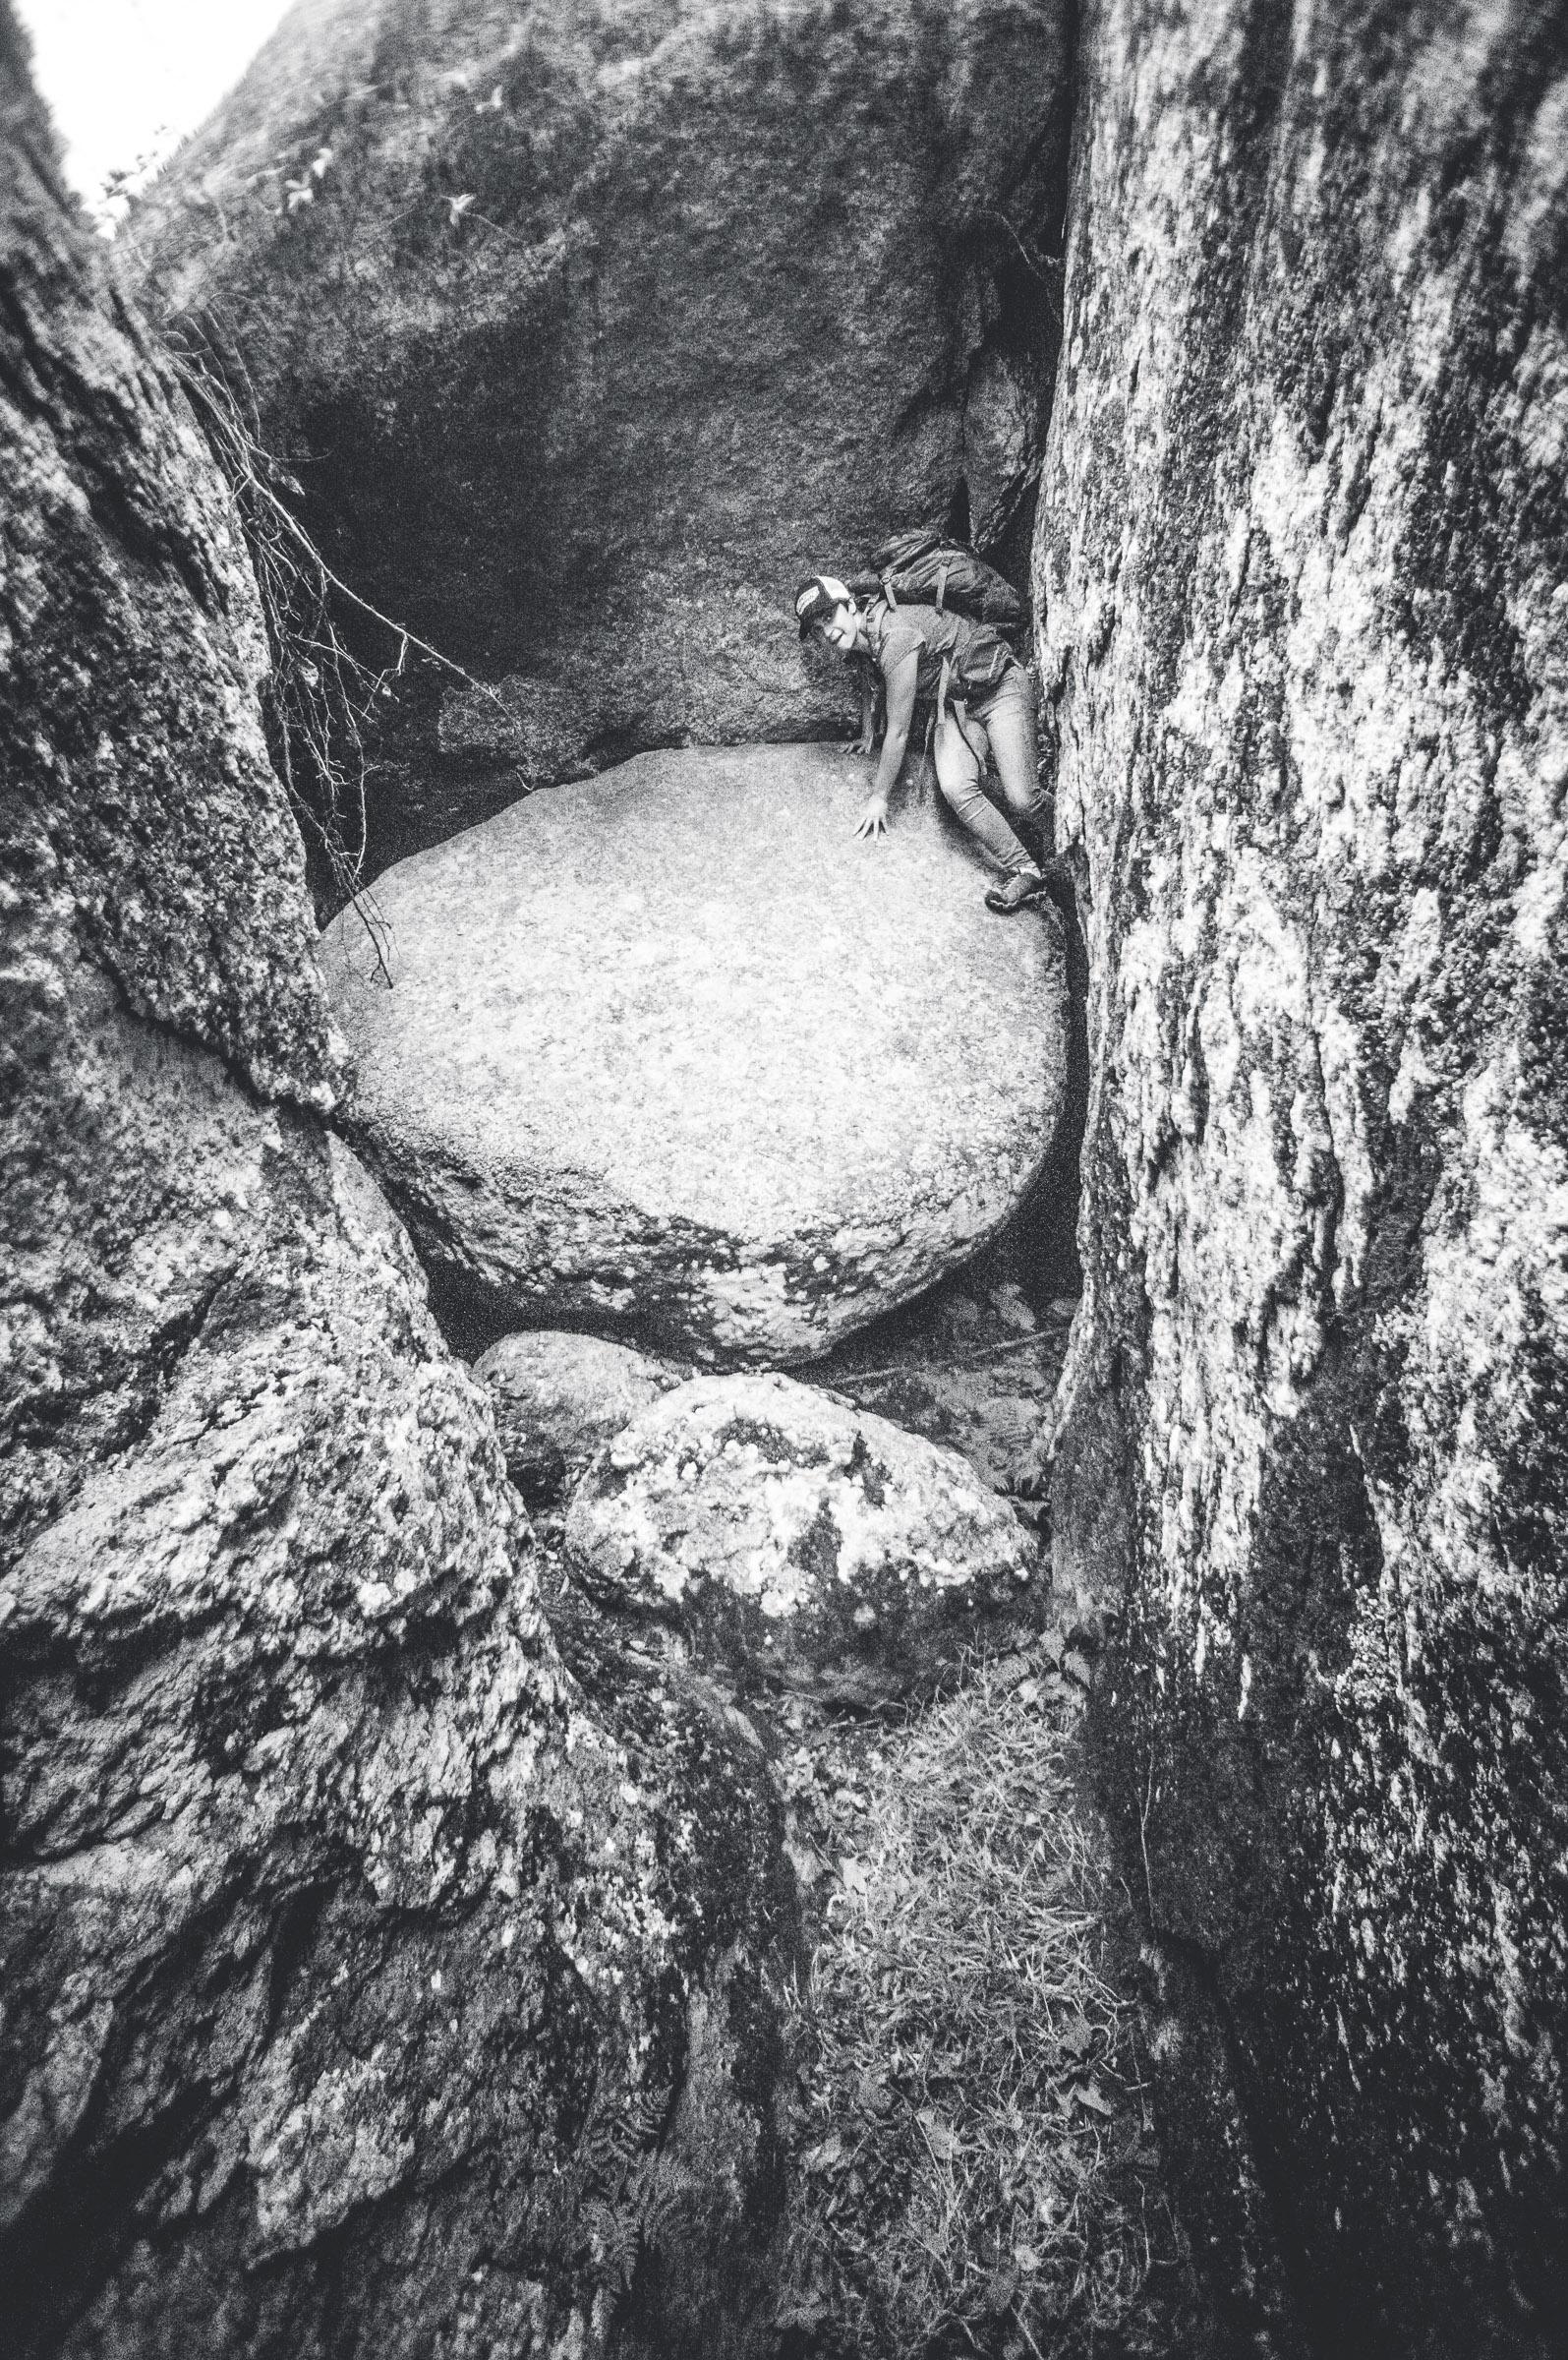 Spanish Cave 11-12-16 B&W (17 of 33).JPG